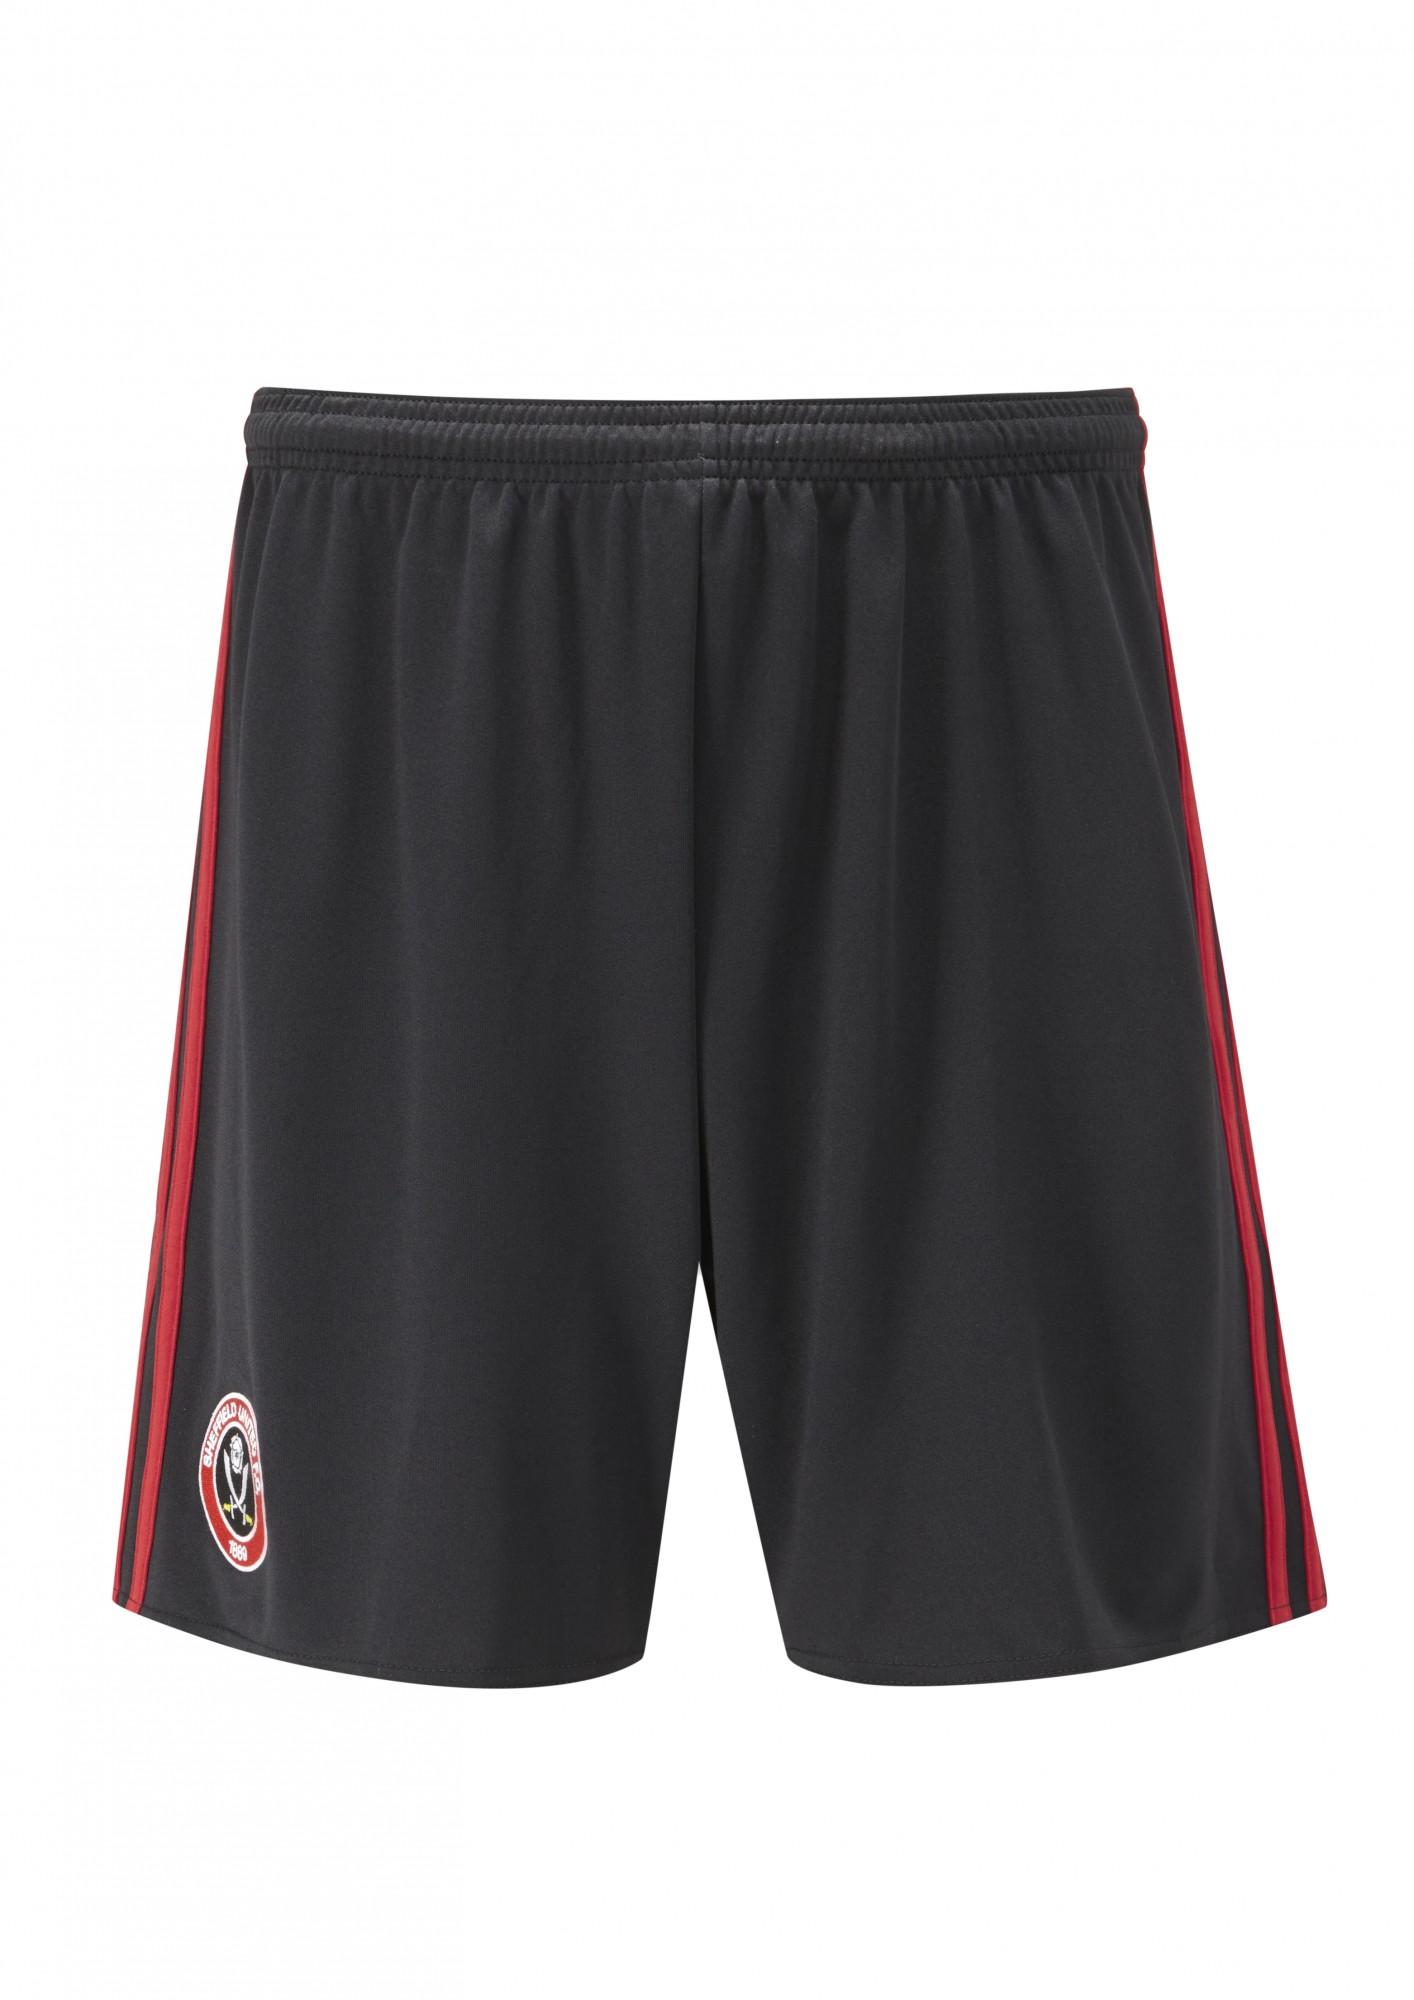 Sheffield United Home Kit 2016-17 shorts